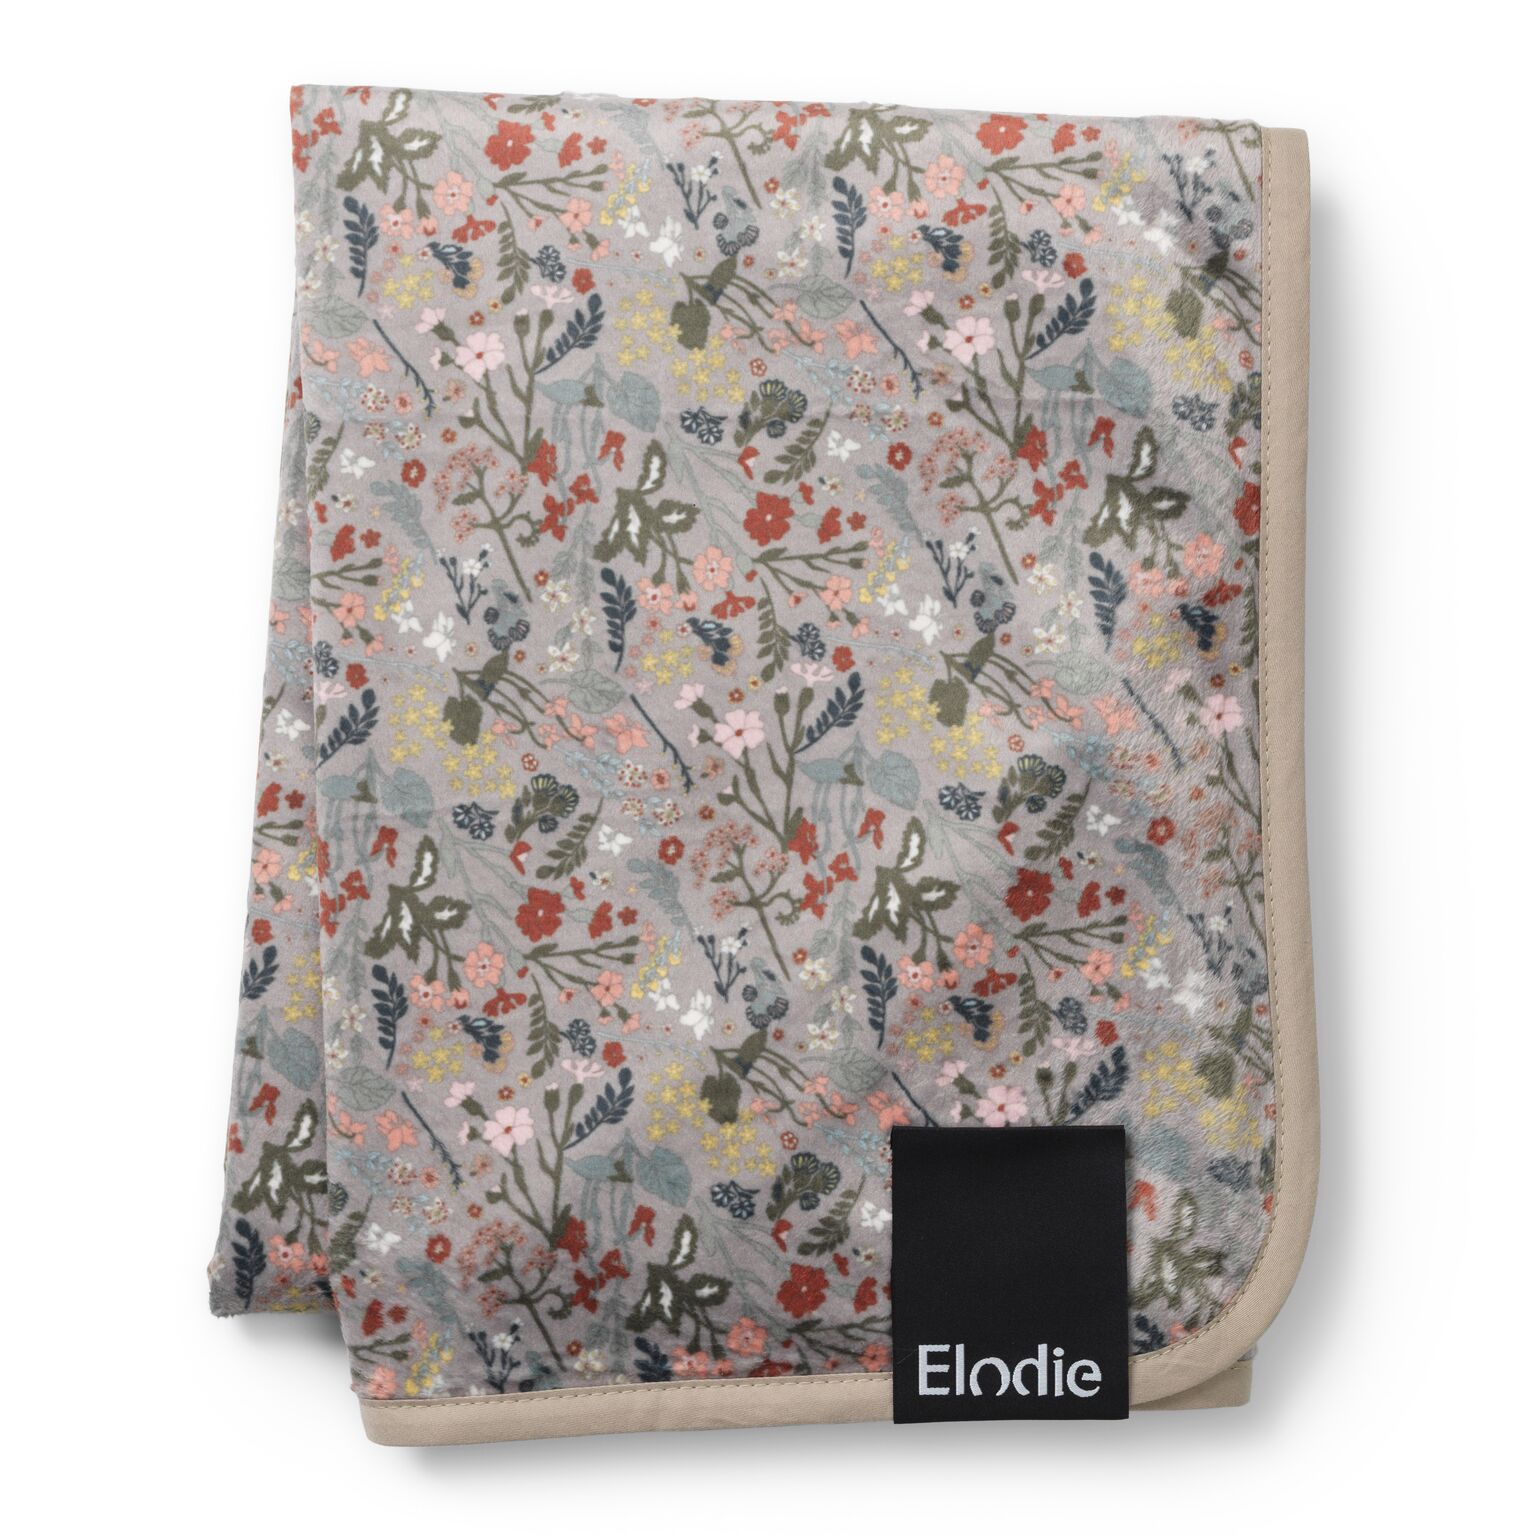 Elodie Details - Velvet Blanket - Vintage Flower